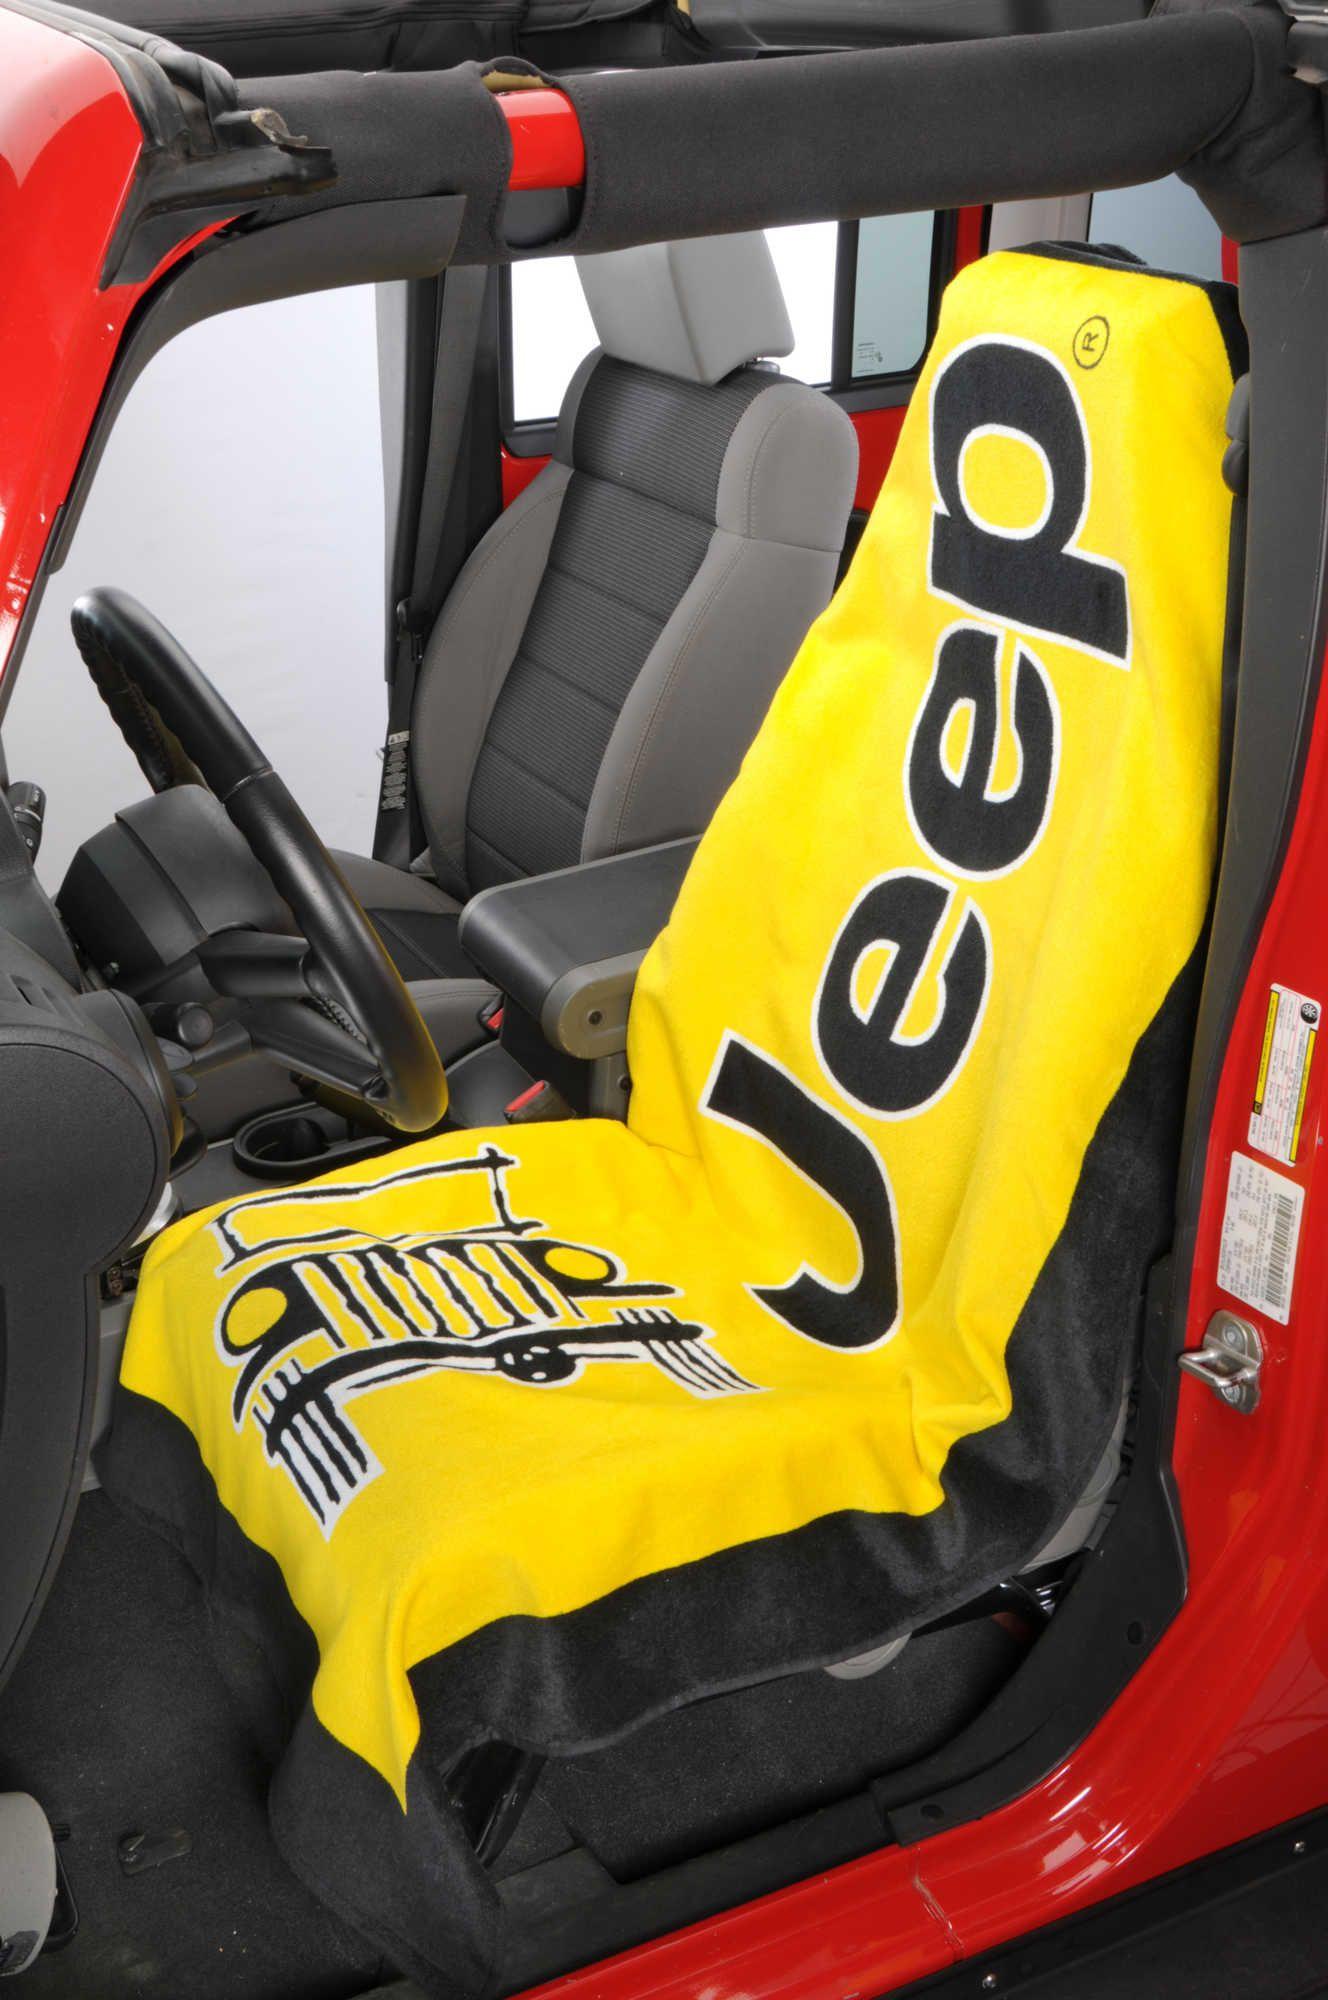 Insync Jeep Logo Towel 2 Go Seat Cover Jeep seats, Jeep